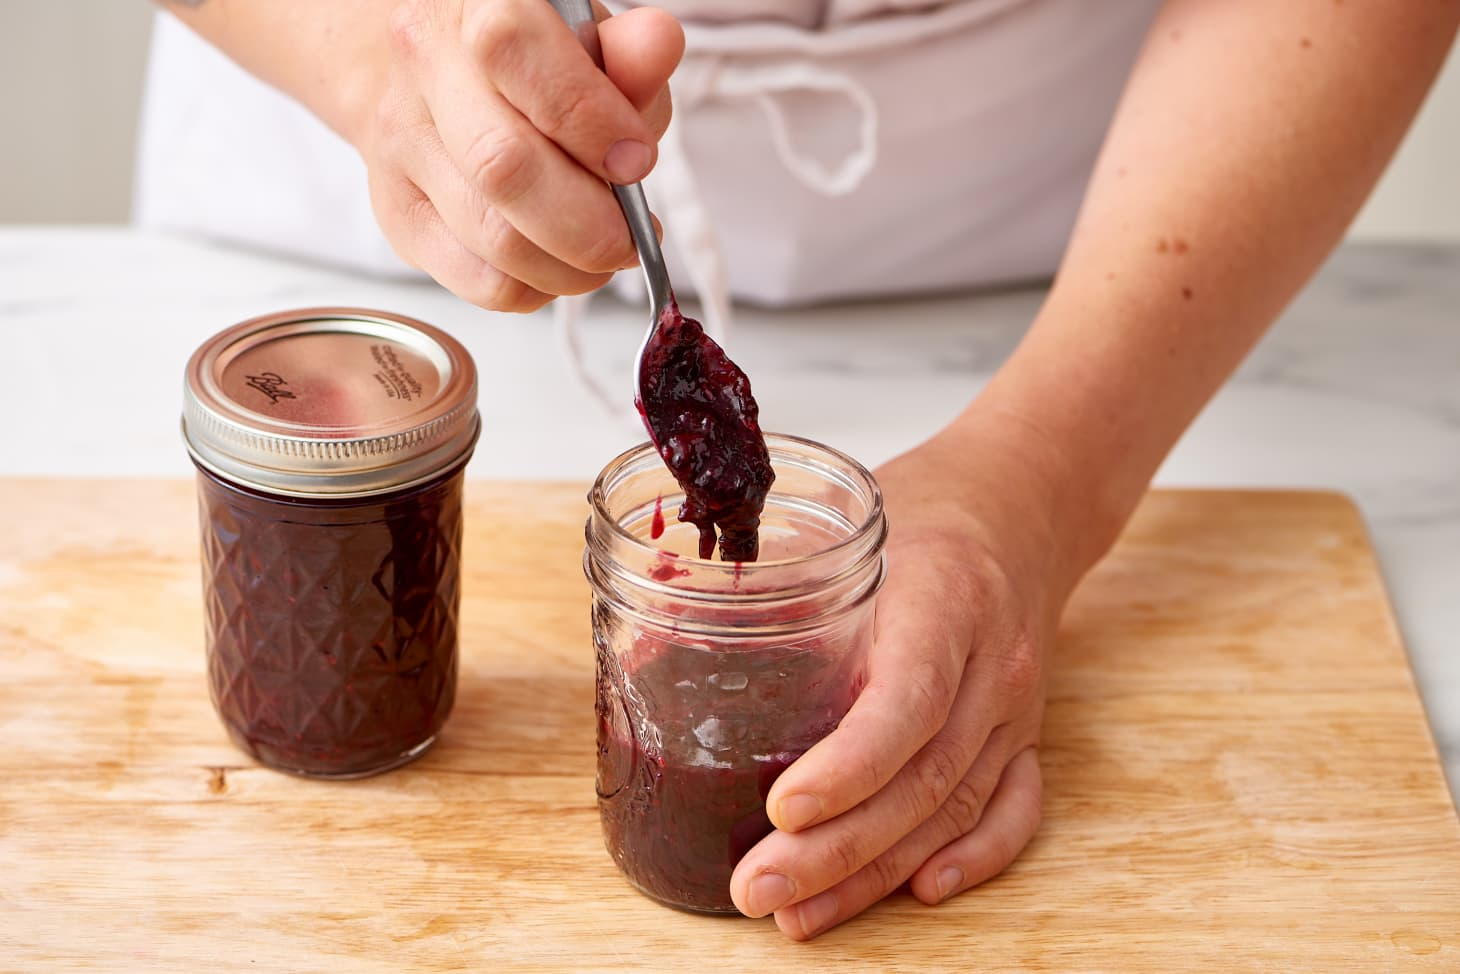 How To Make Basic Fruit Jam